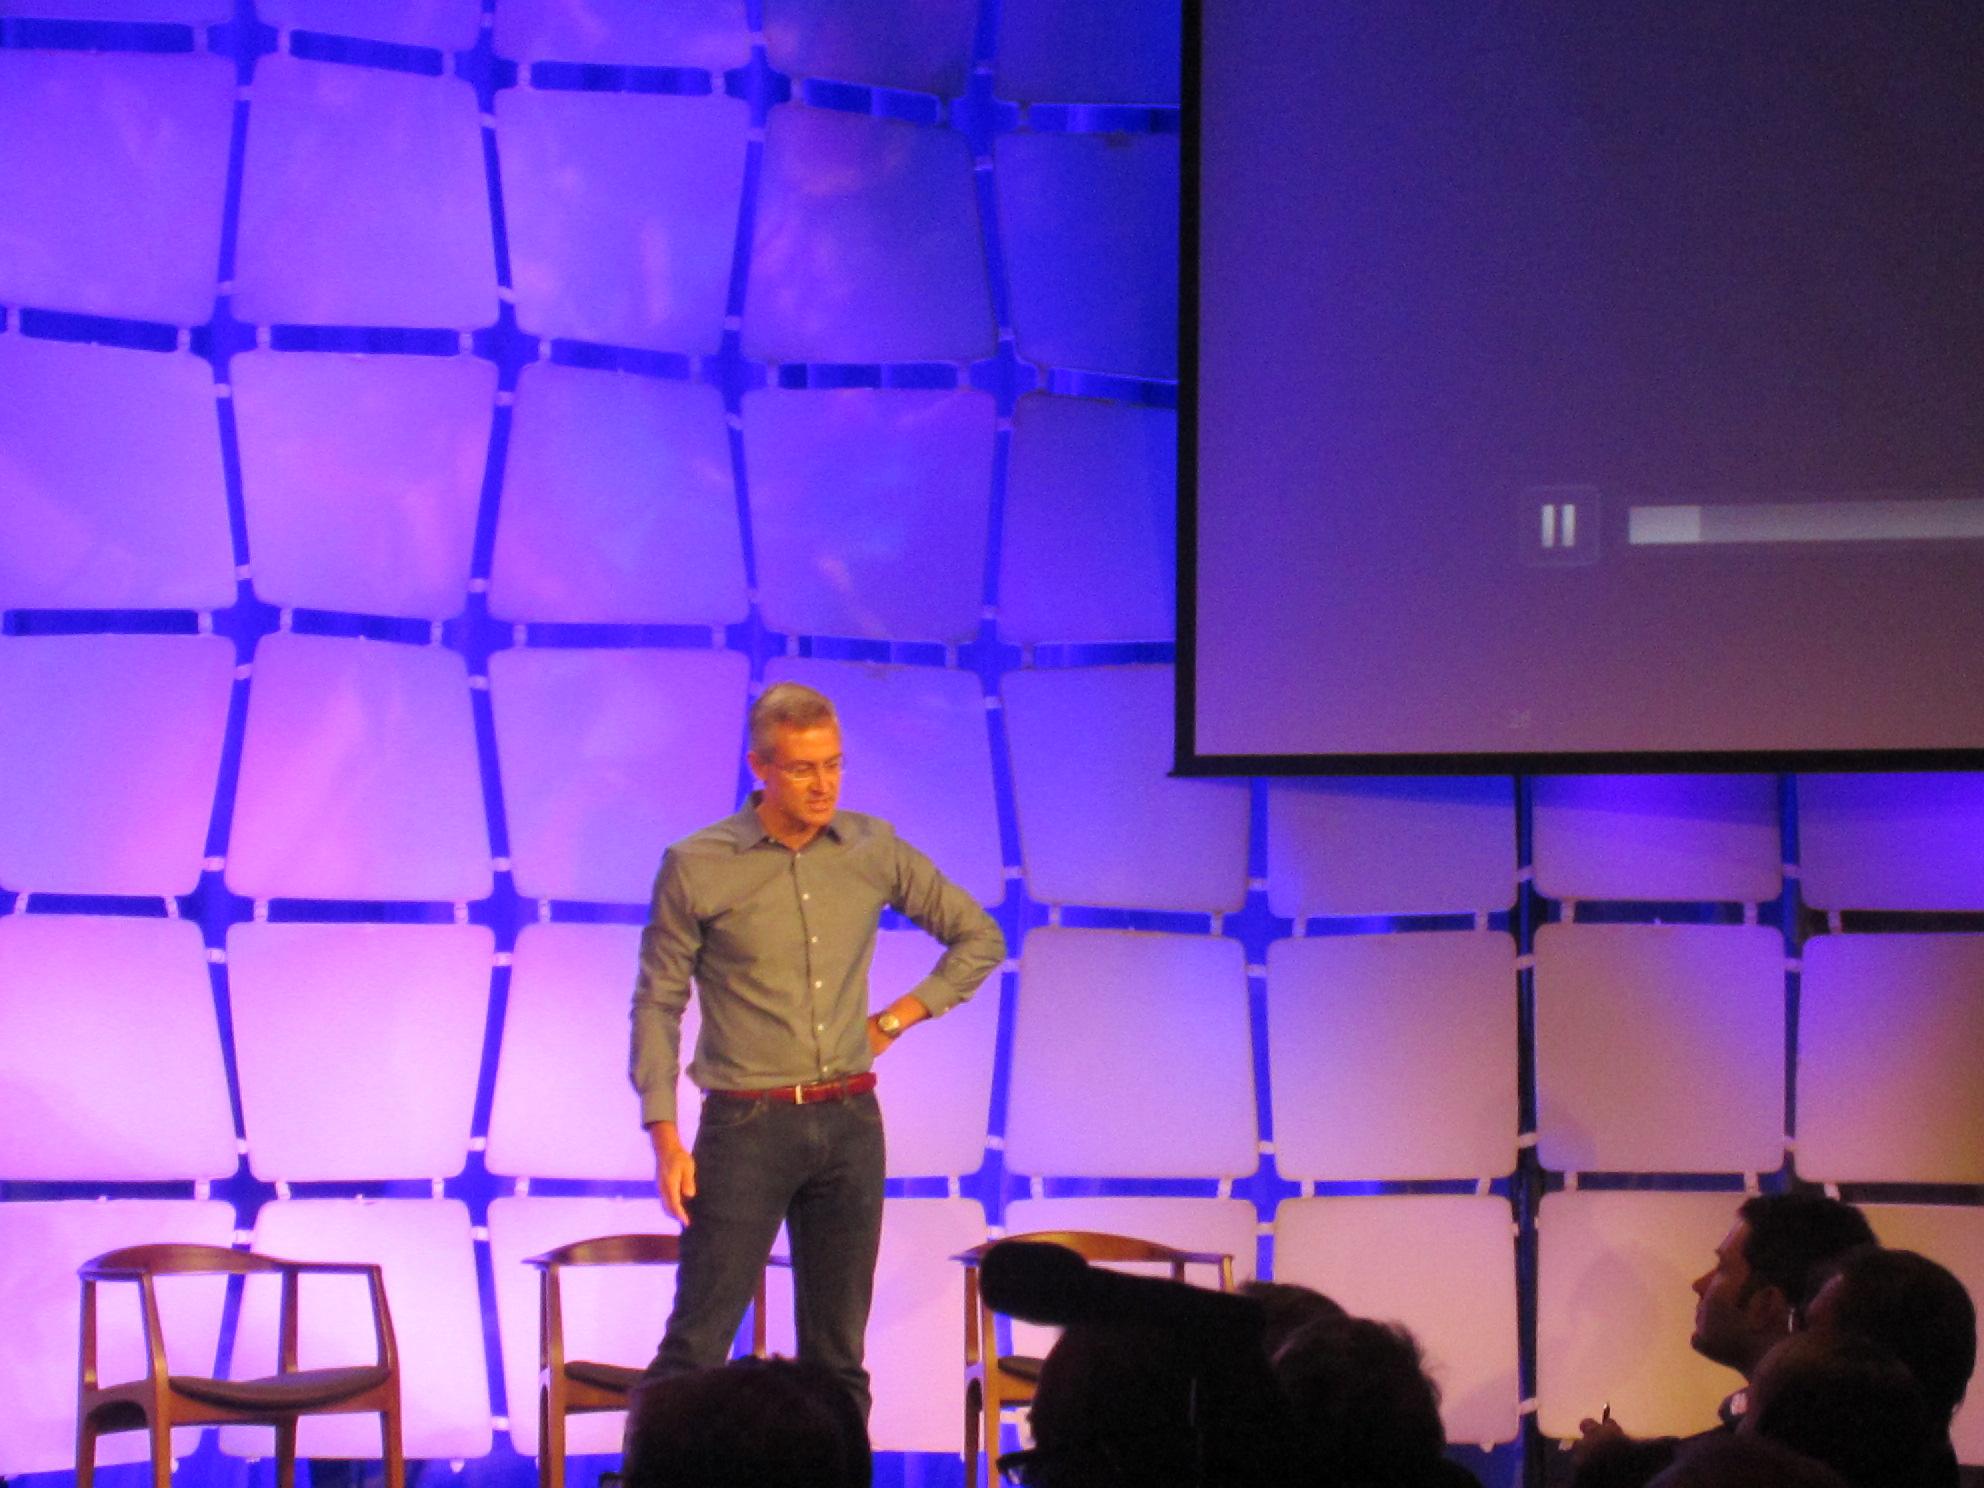 MC10 CEO David Icke speaking at EMtech 2012.